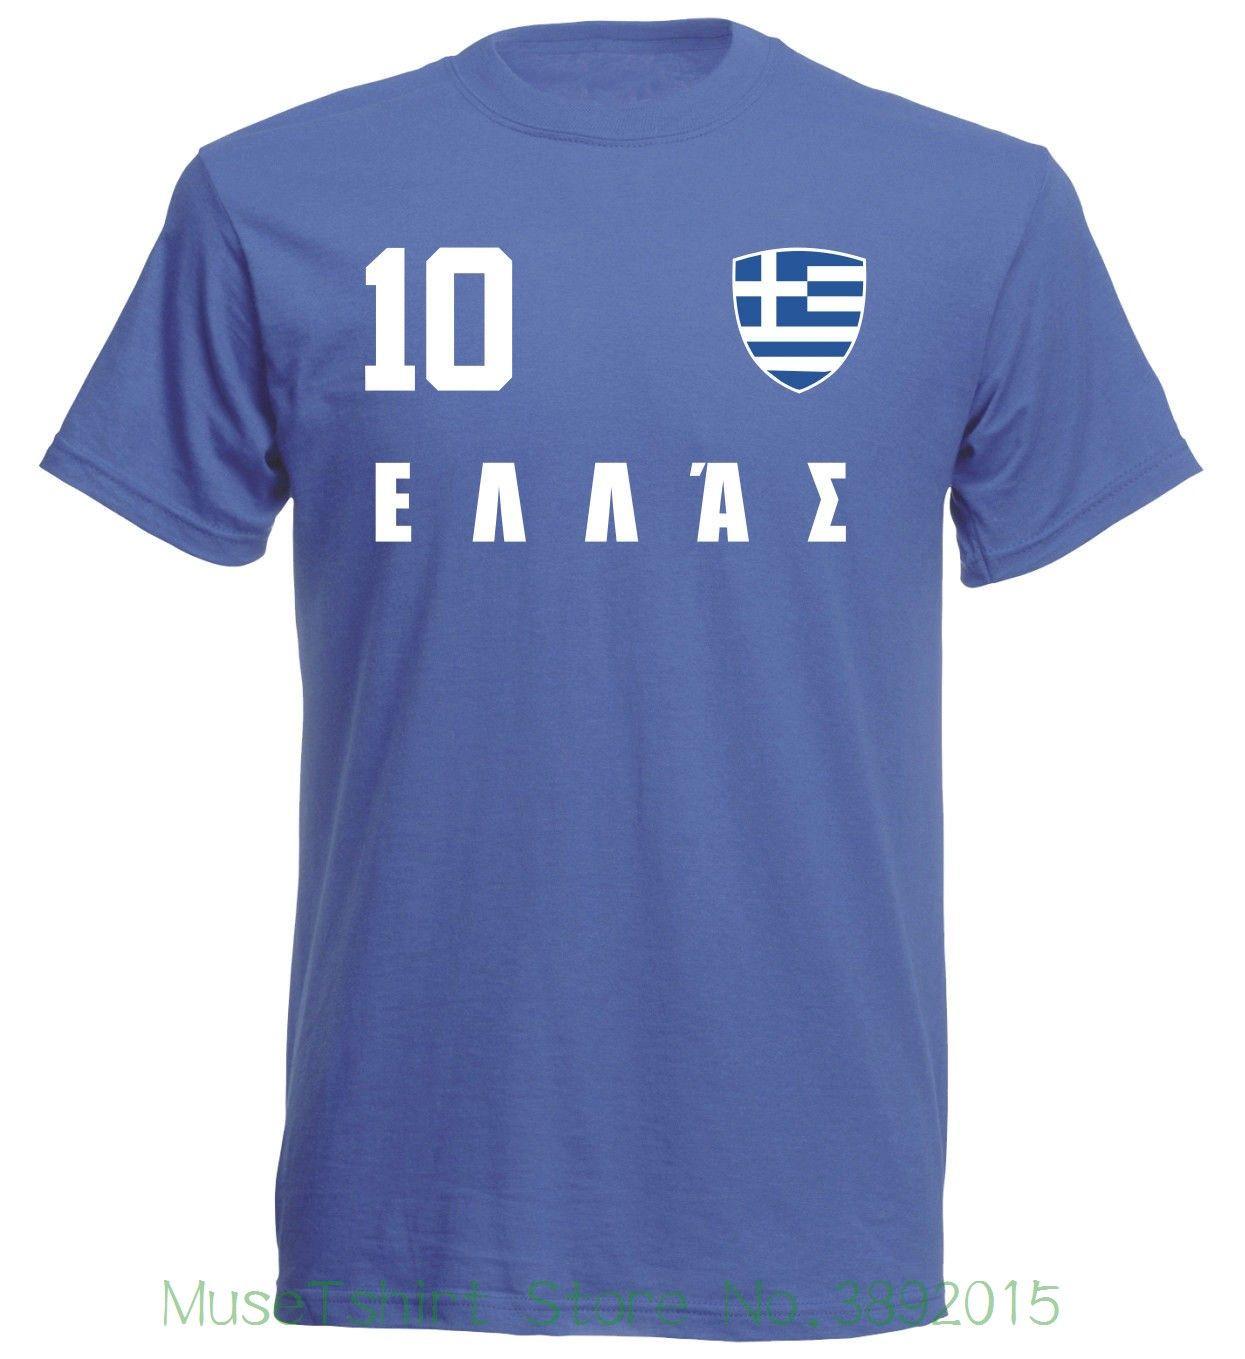 Griechenland Hellas Wm 2018 T Shirt Blau Trikot Fu   Ball Nr All 10 Sportsy  Print T Shirts Men Funny Printed Shirts Cool Tee Shirts Designs From ... fd0f020a39